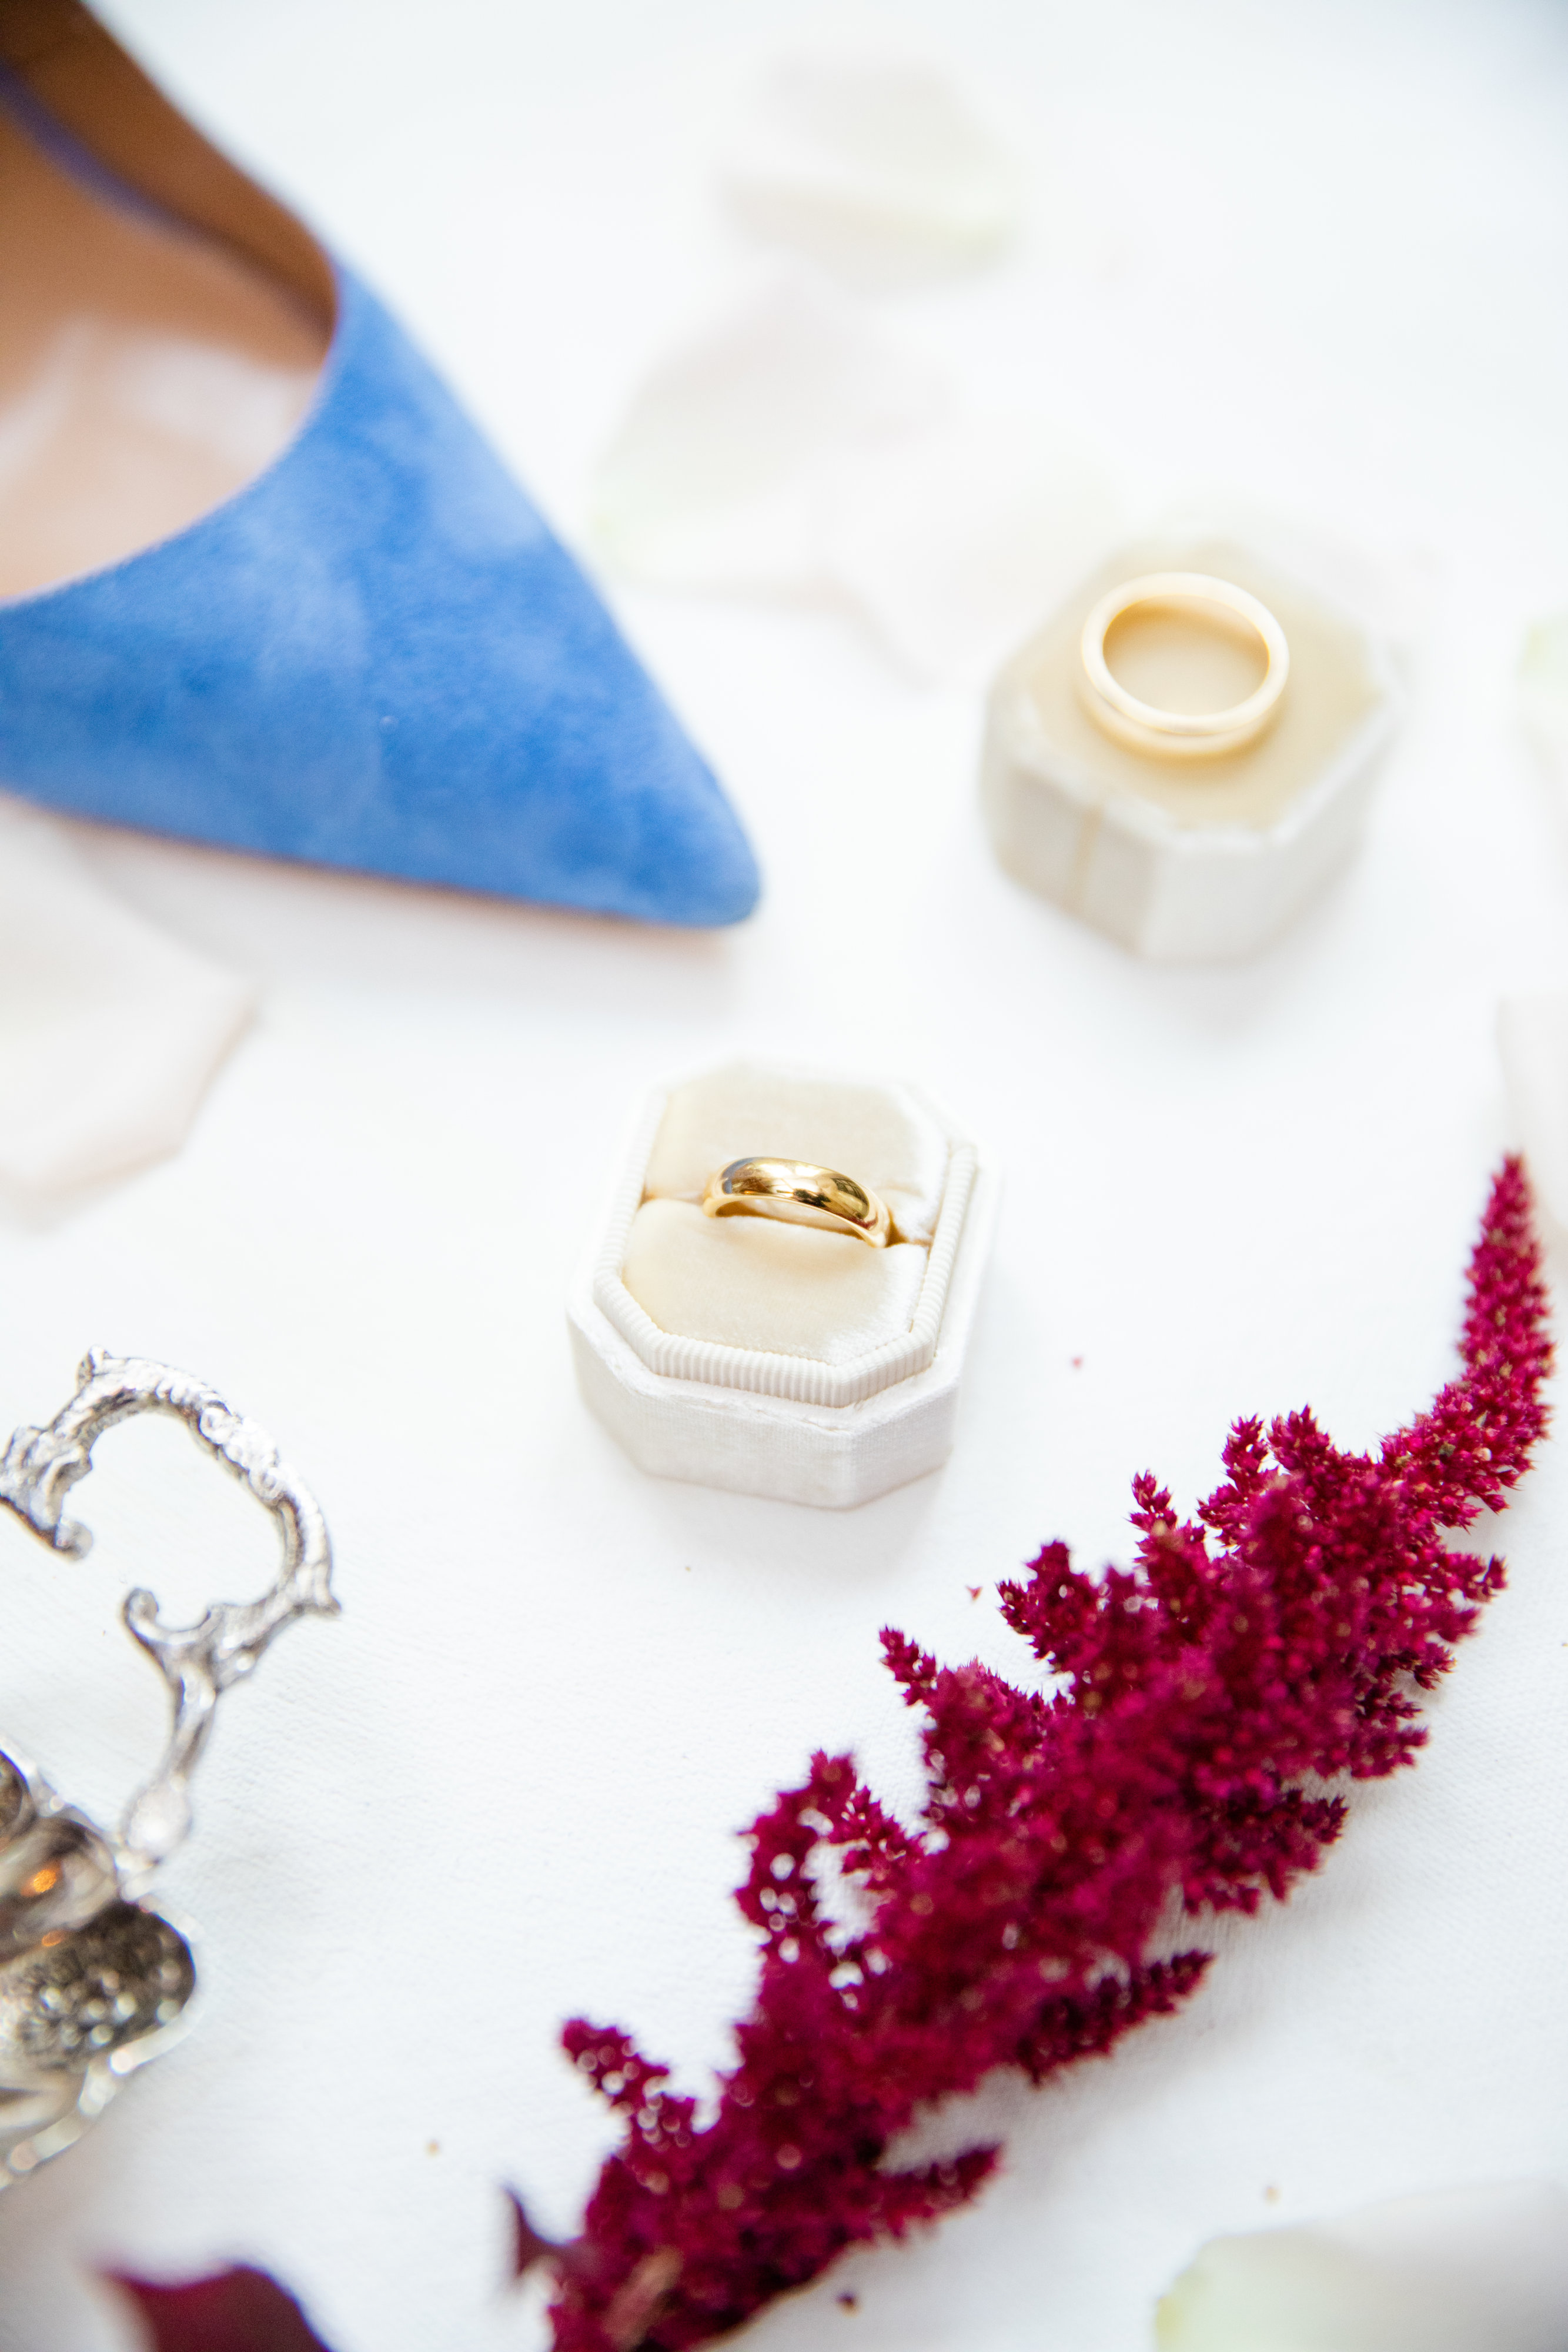 StefanieKamermanPhotography-MelanieandBenjamin-Wedding-Bethesda,MD-2019-10-12-64